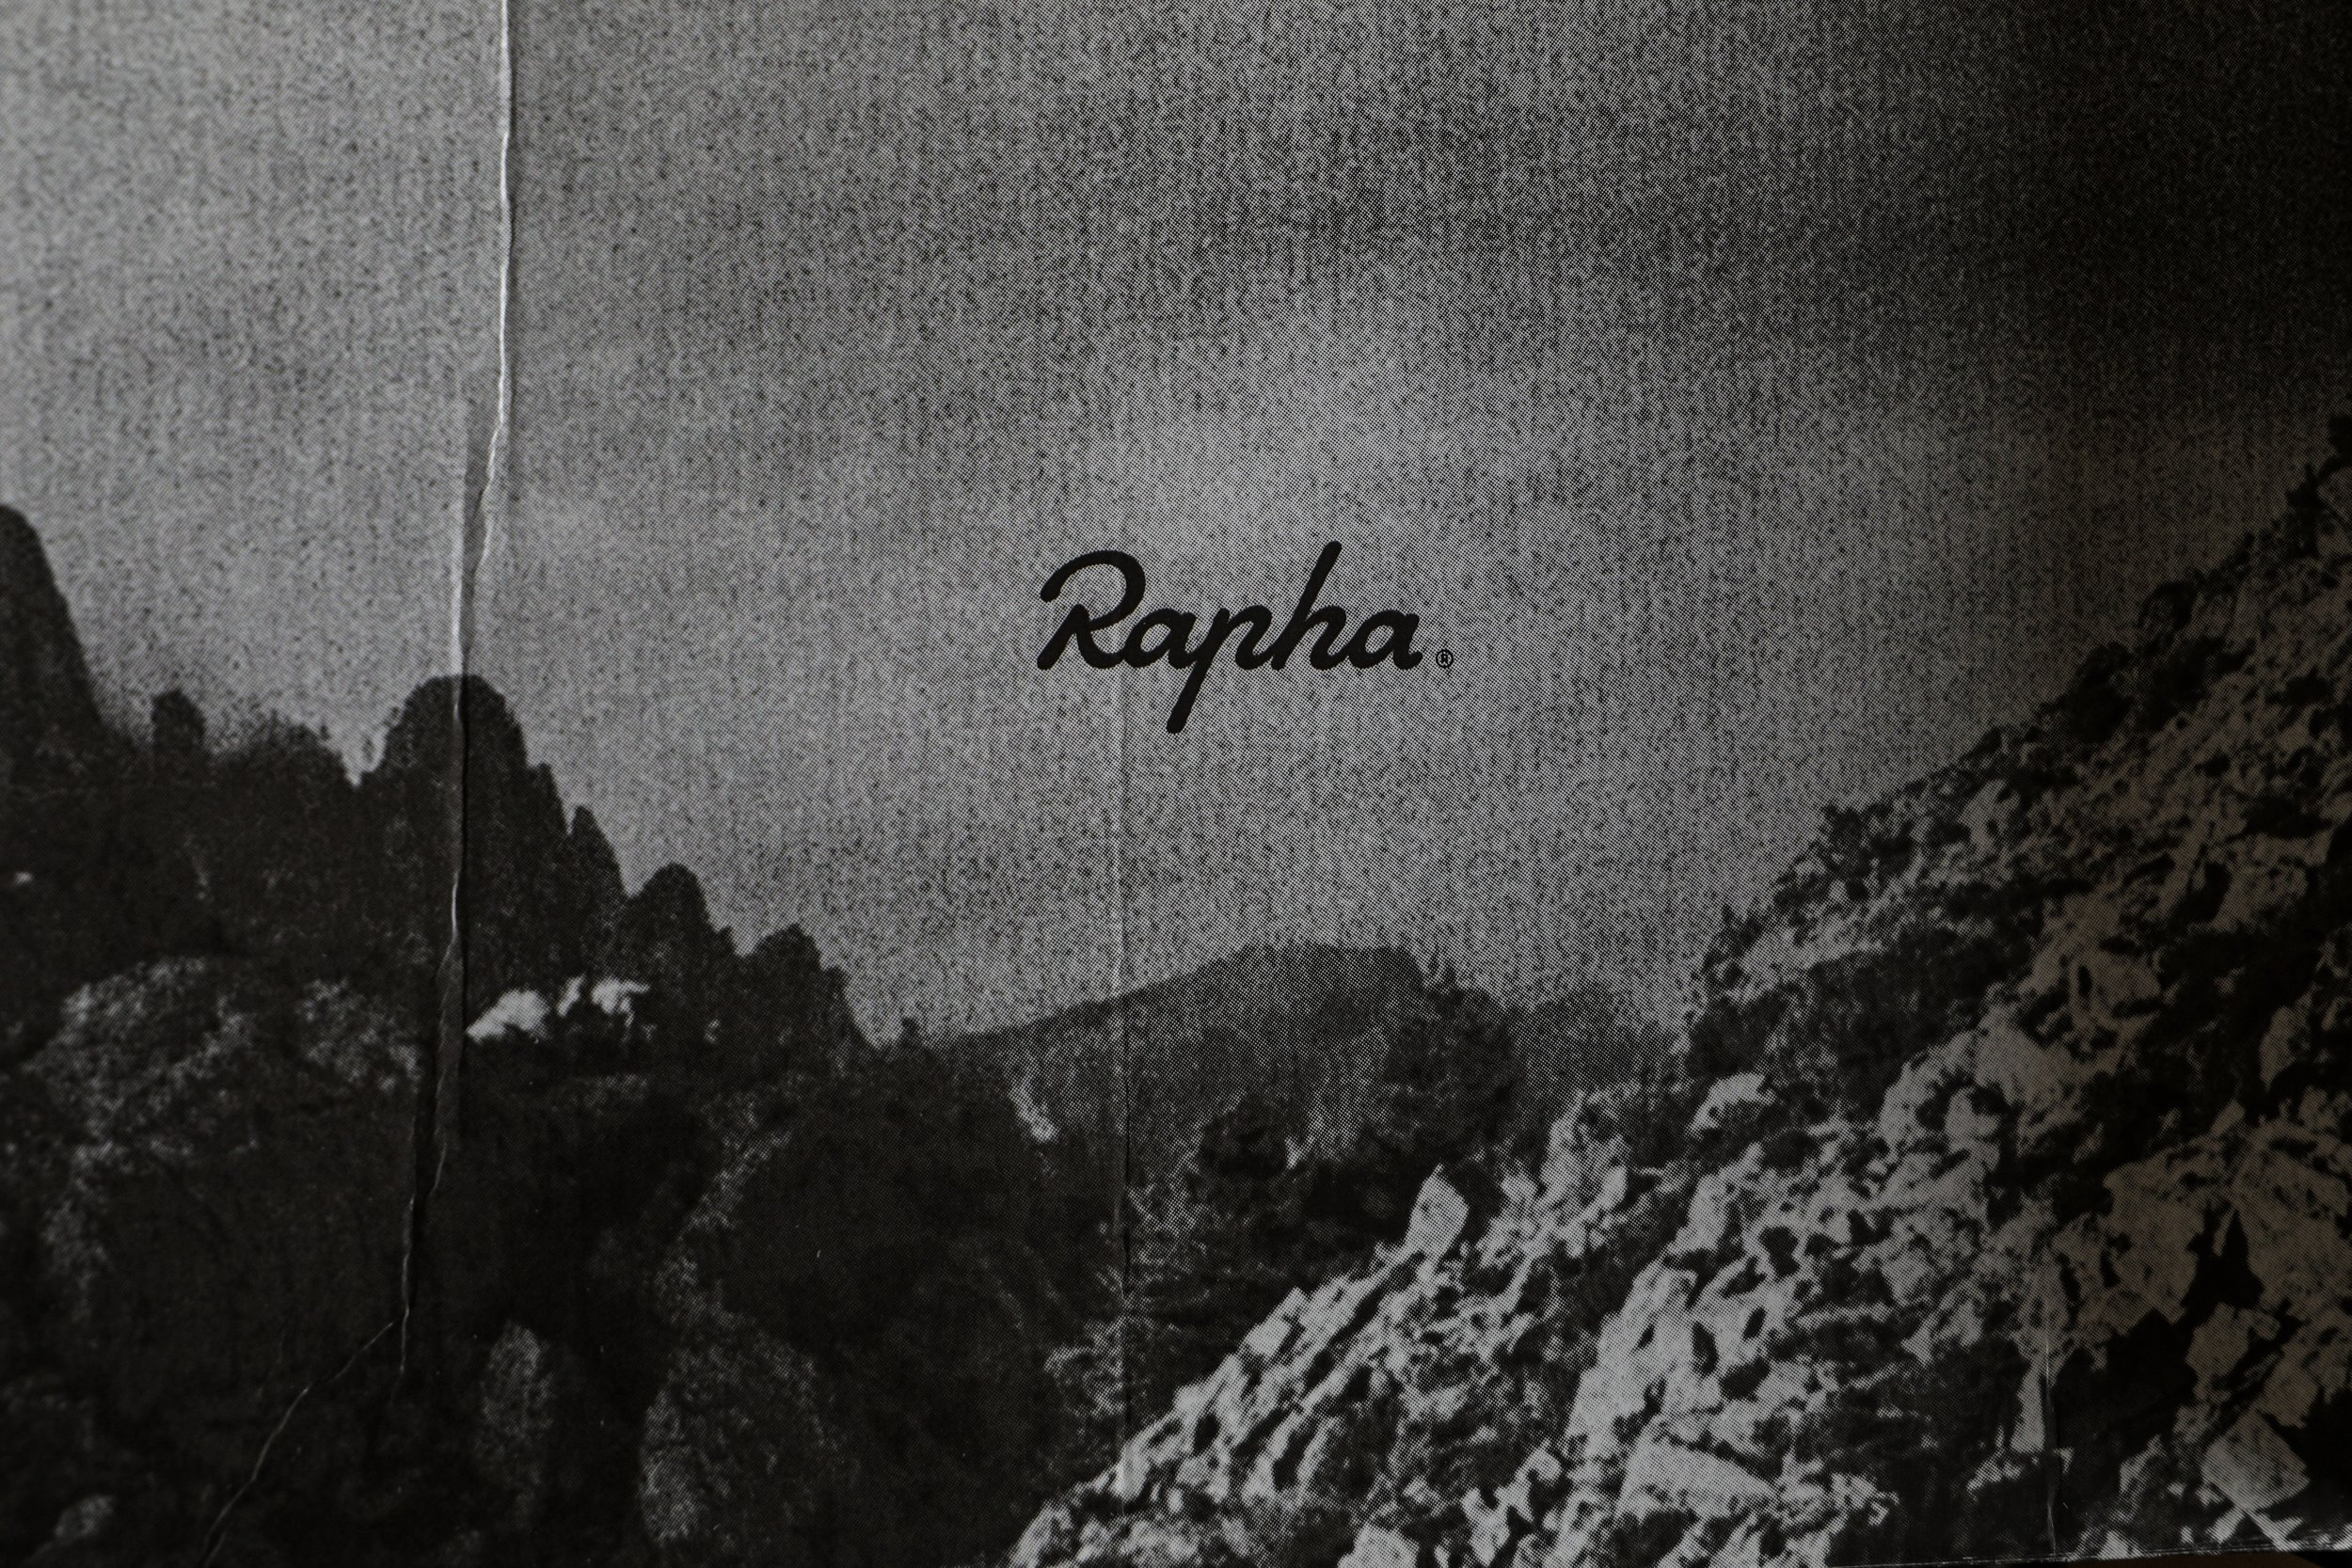 Rapha mondial magazine